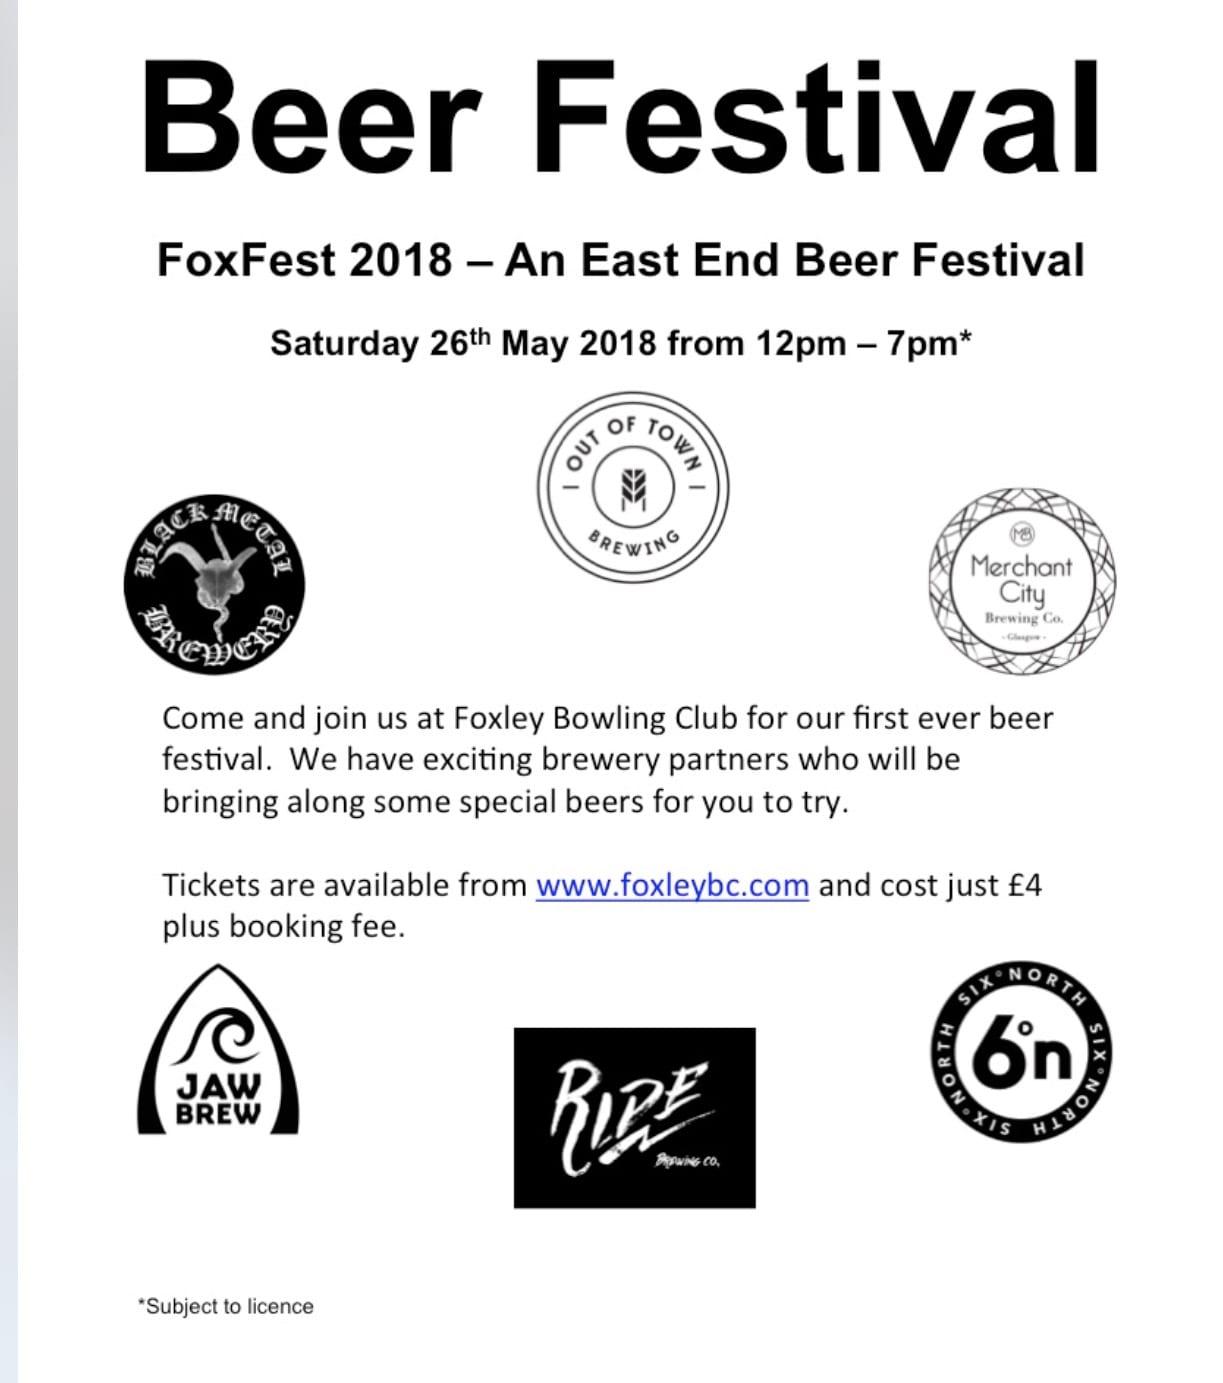 FoxFest glasgow beer festival East End